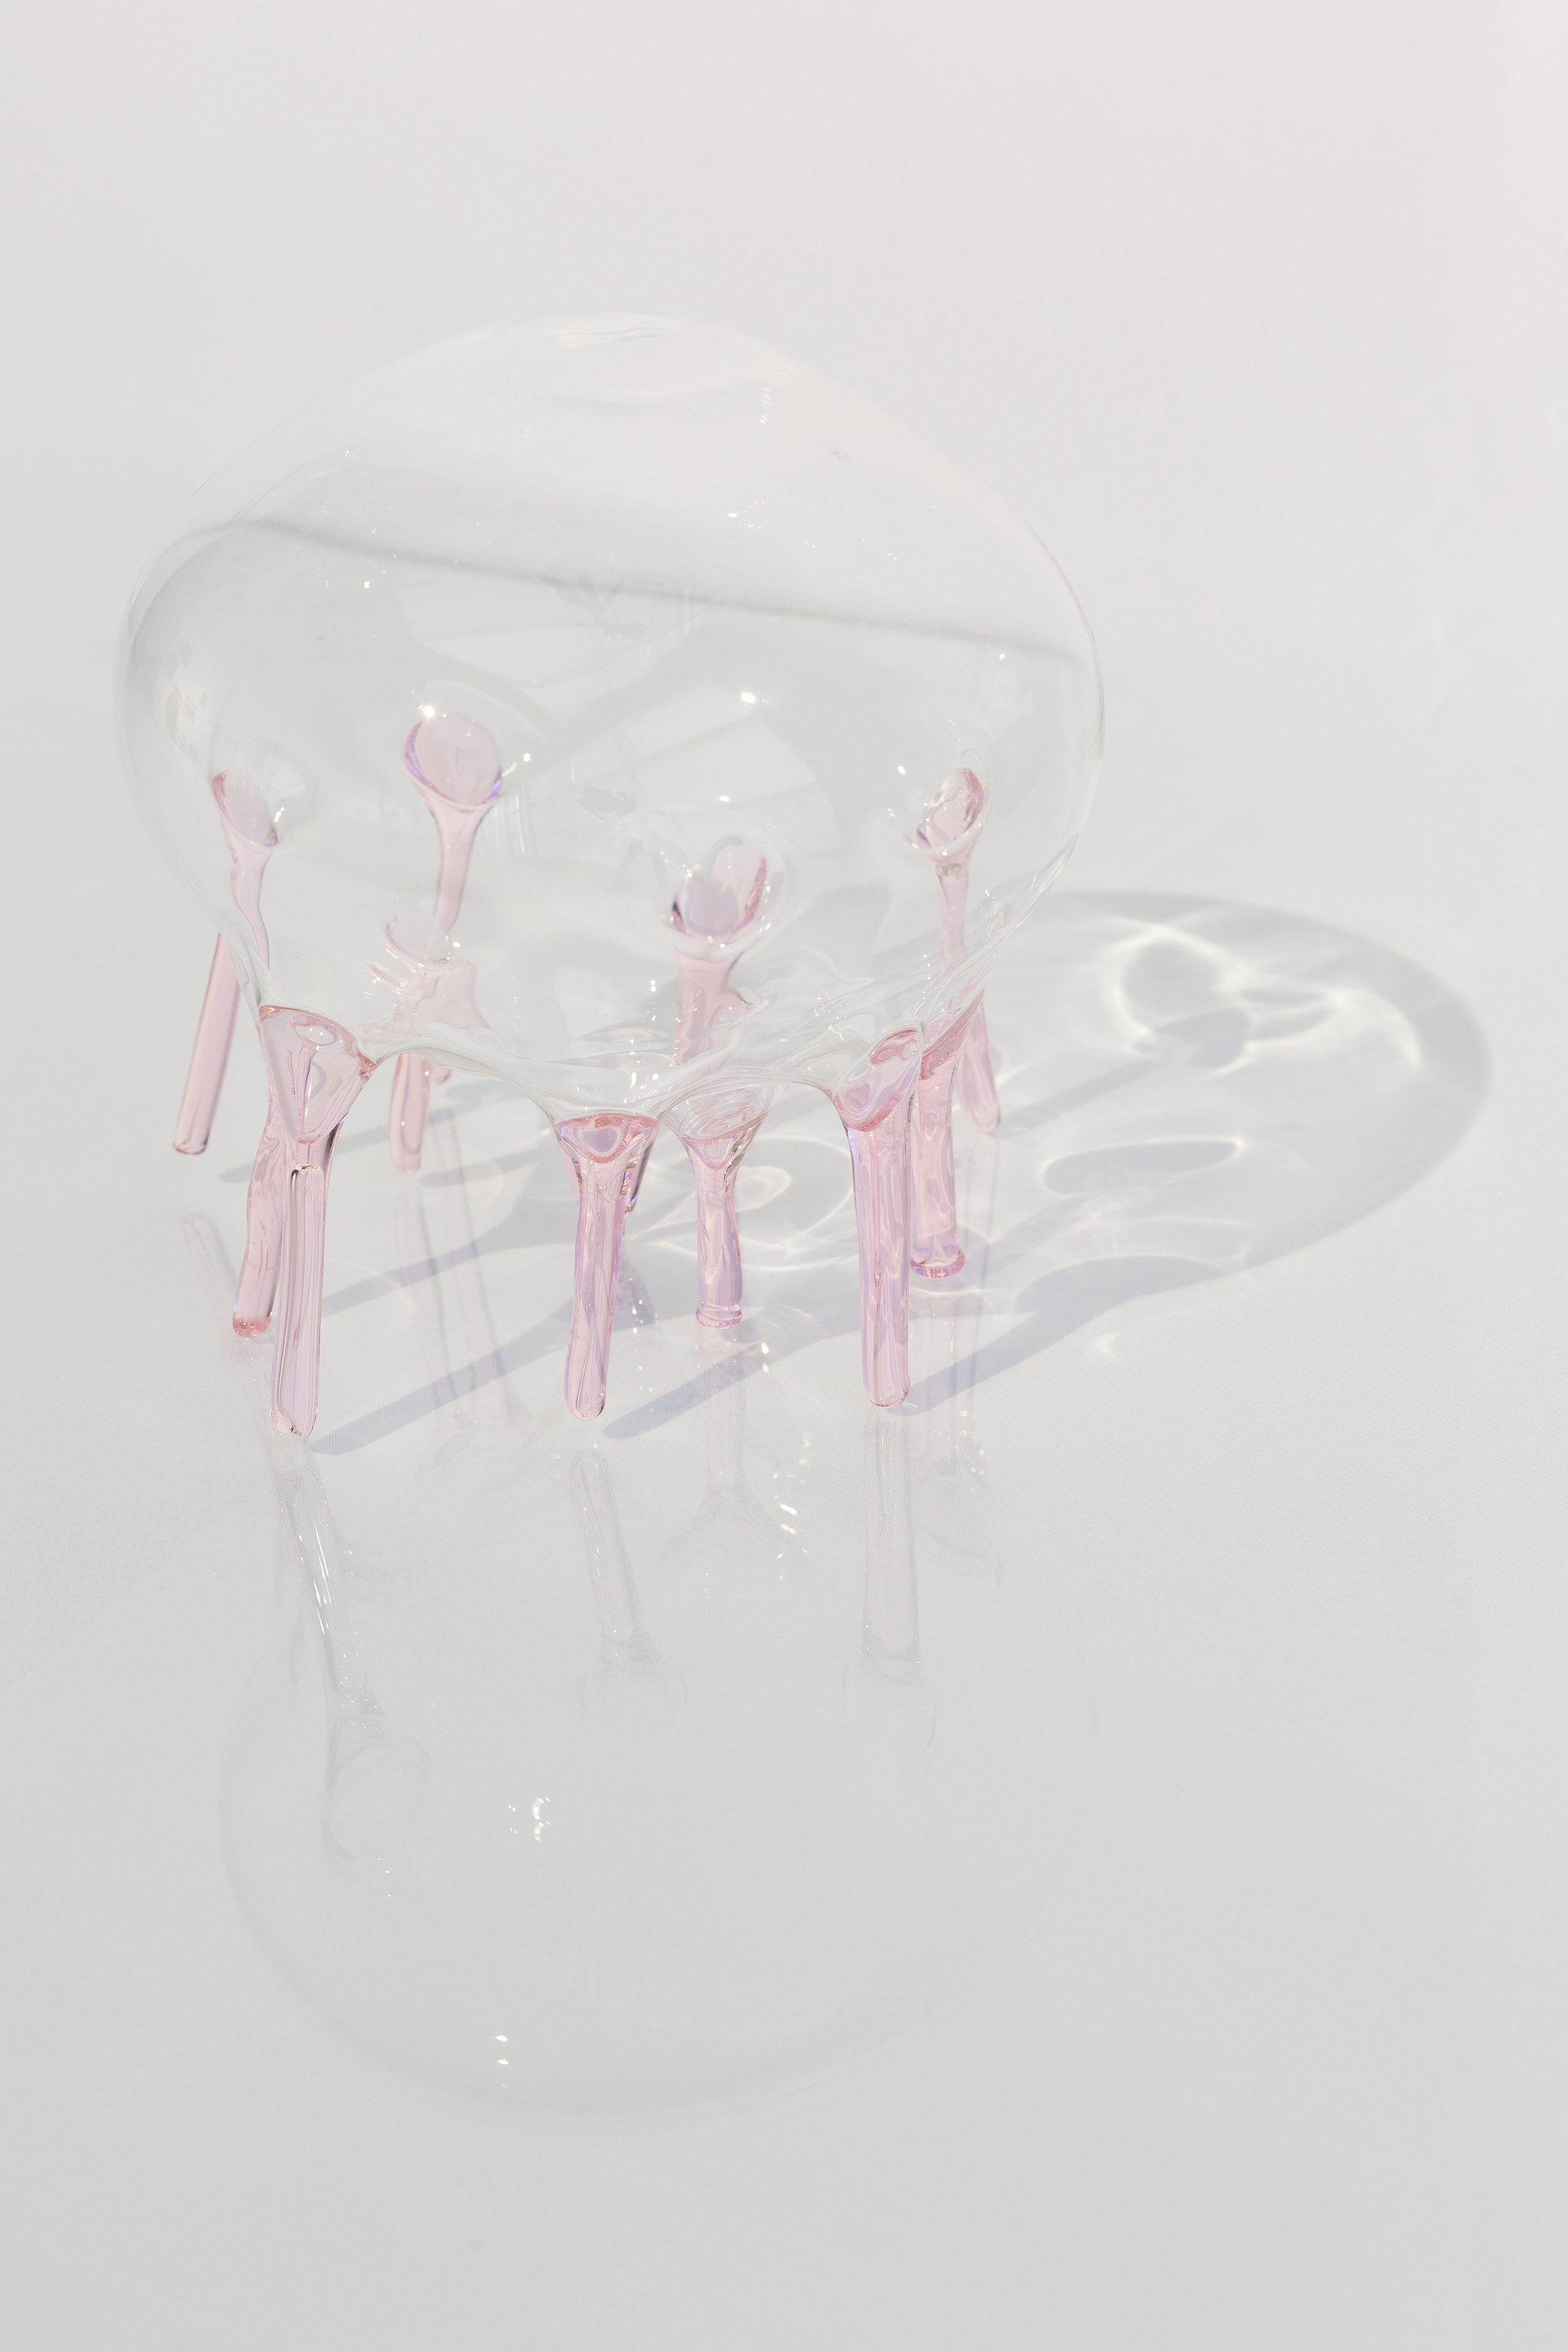 Dima Srouji_Hollow Forms_Peter_2017_Hand-blown glass_.jpg